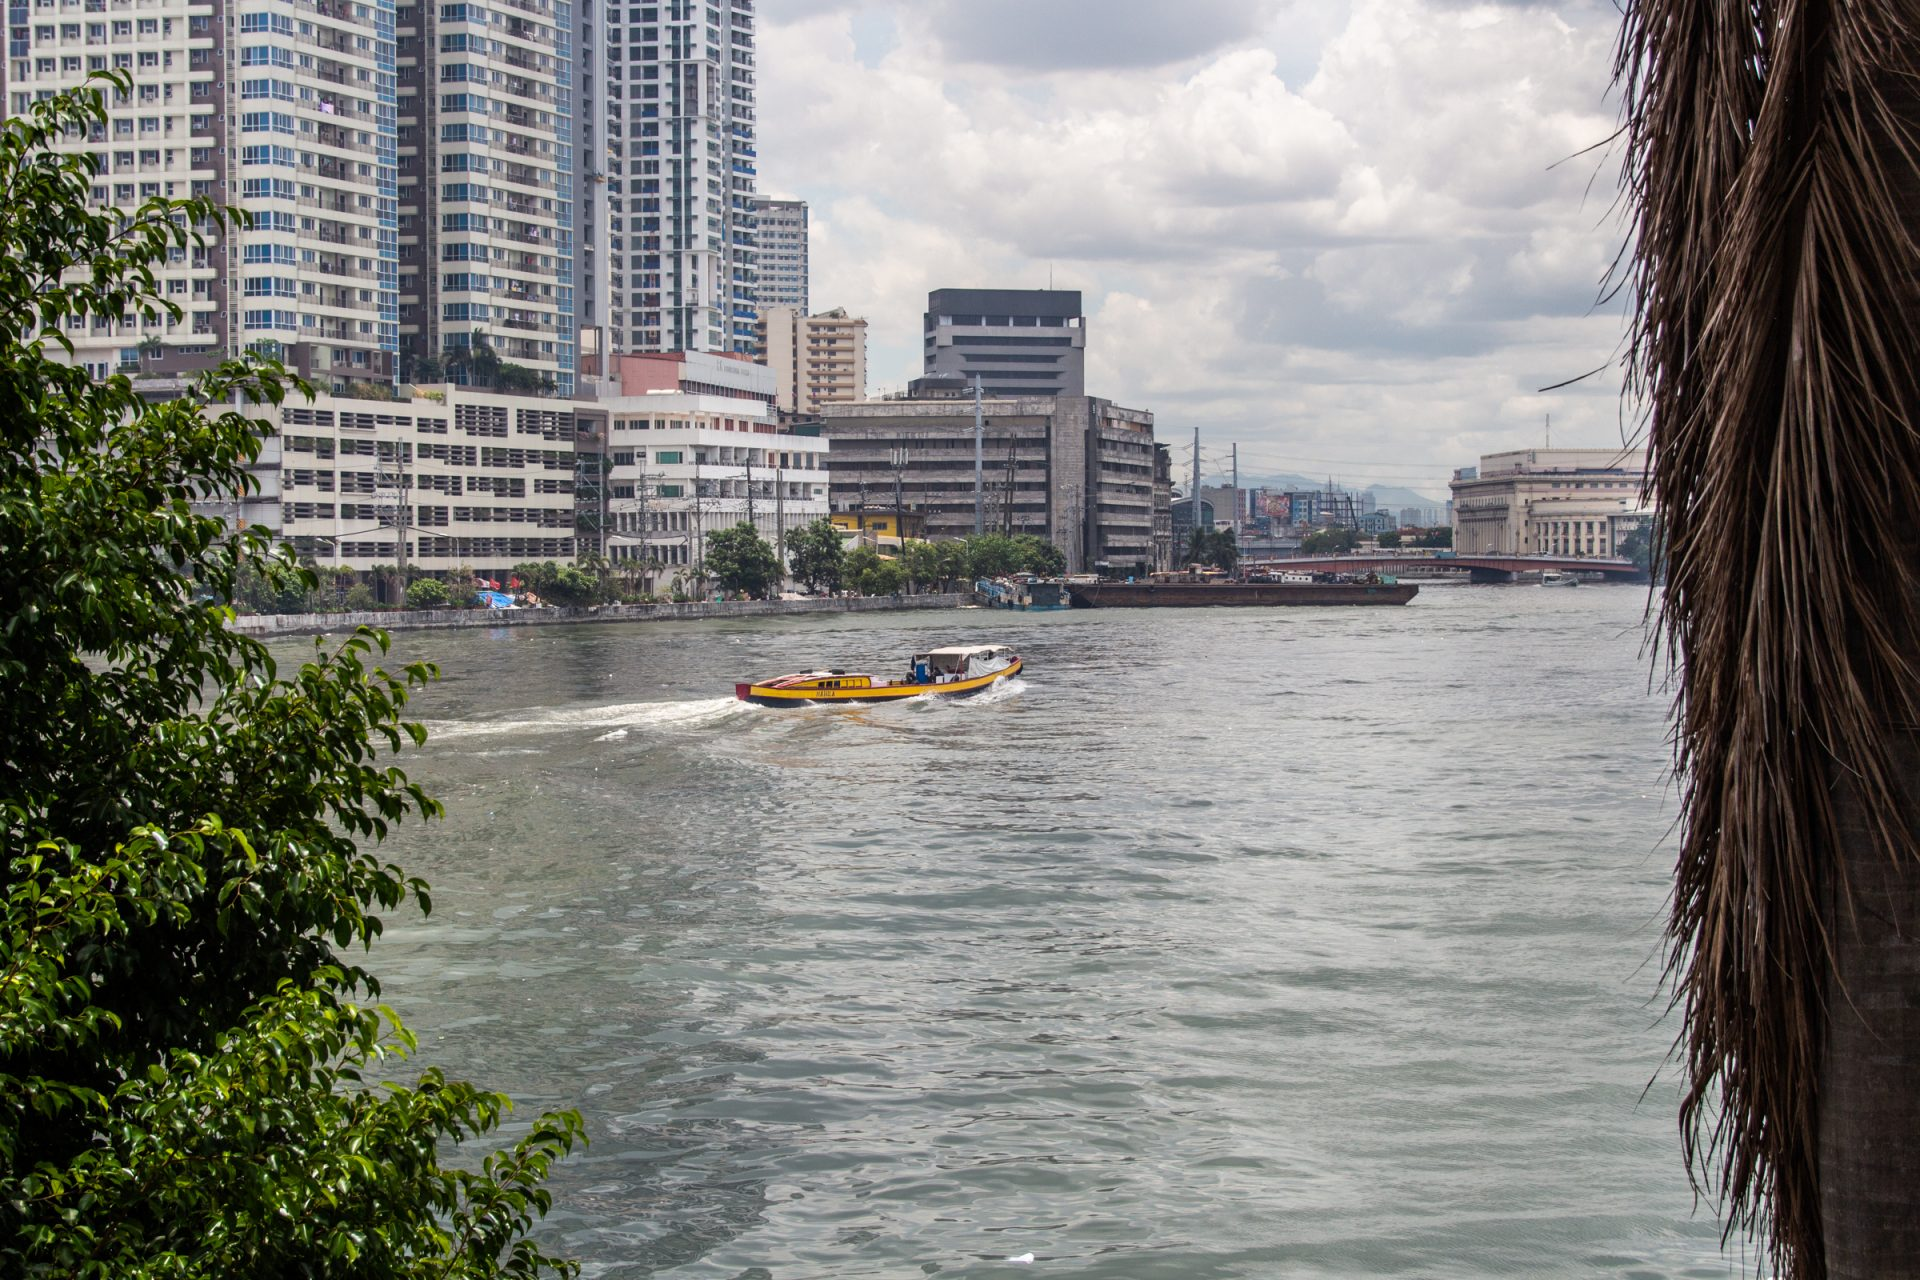 Boat Cruising Through Water Near Tall Buildings